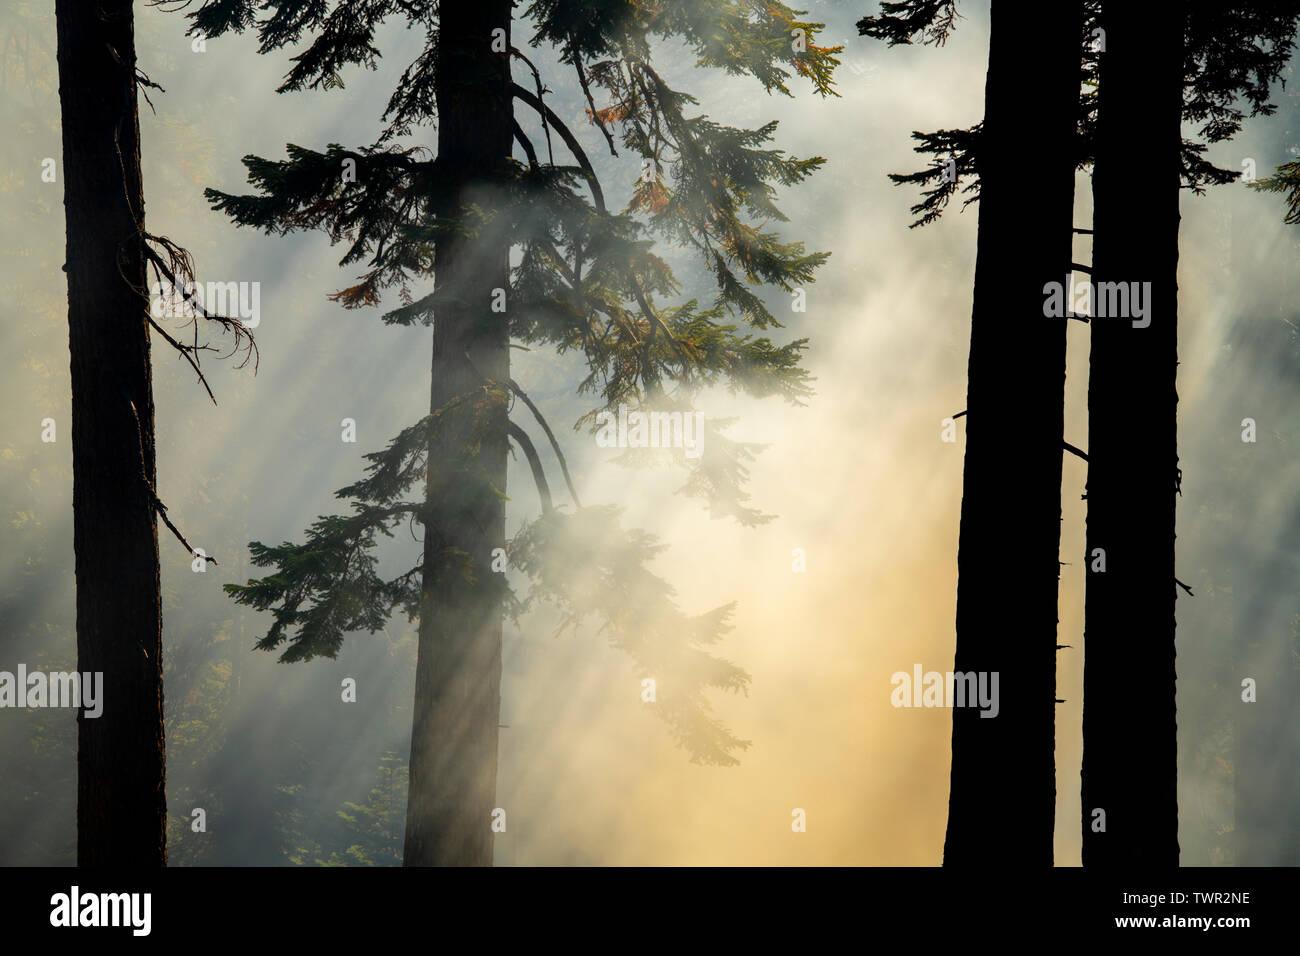 Smoky woods, conifers, Prescribed burn, Yosemite National Park, California, USA, by Bill Lea/Dembinsky Photo Assoc Stock Photo